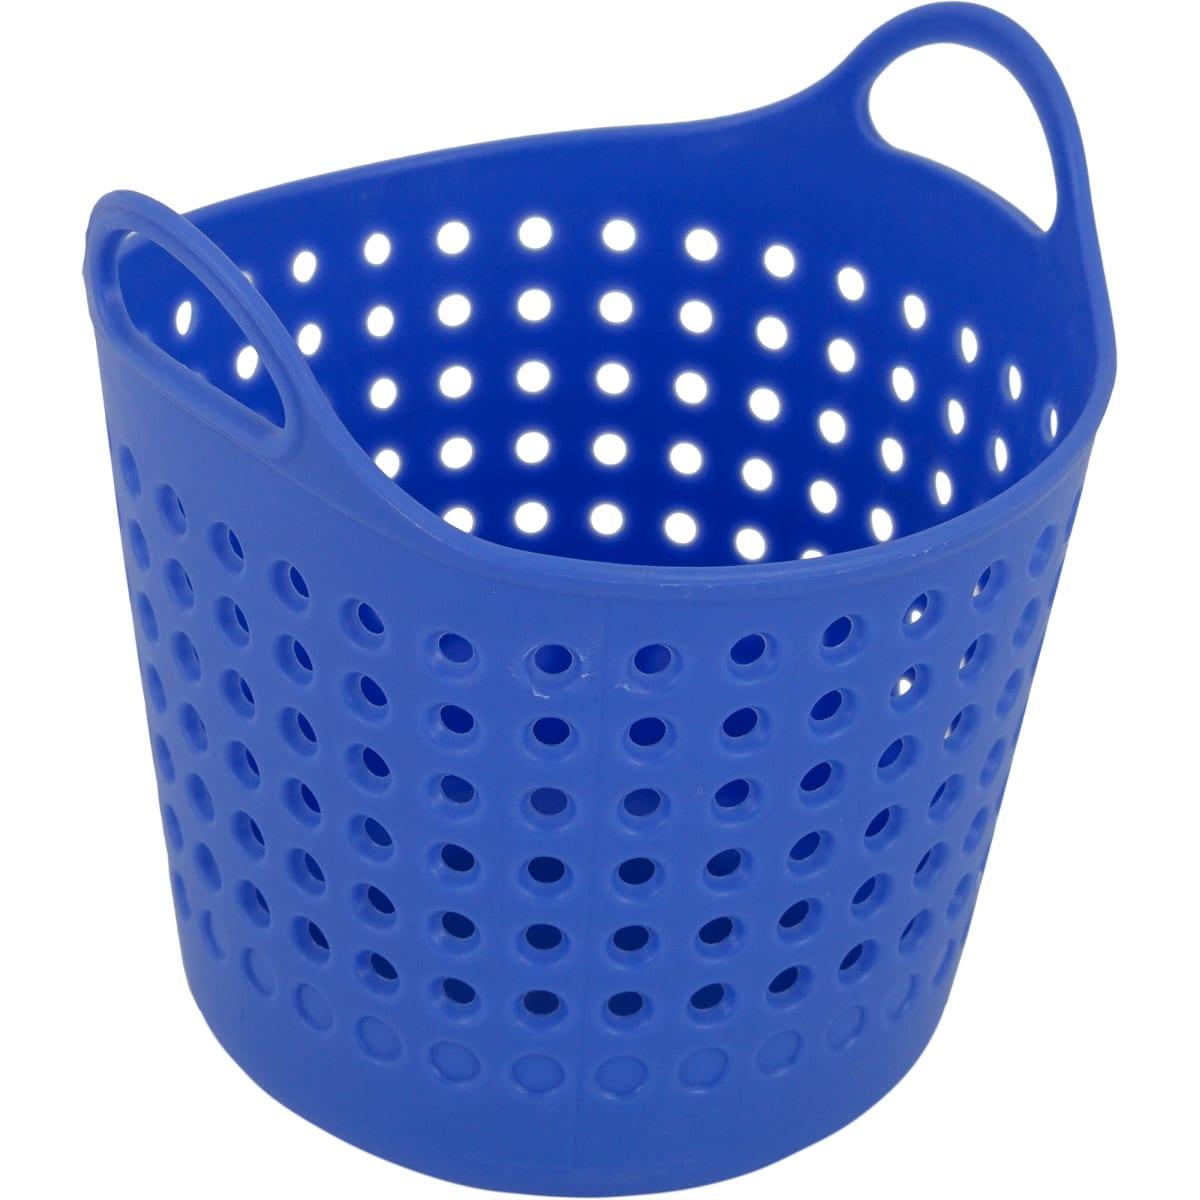 Корзинка для мелочей, цвет синий